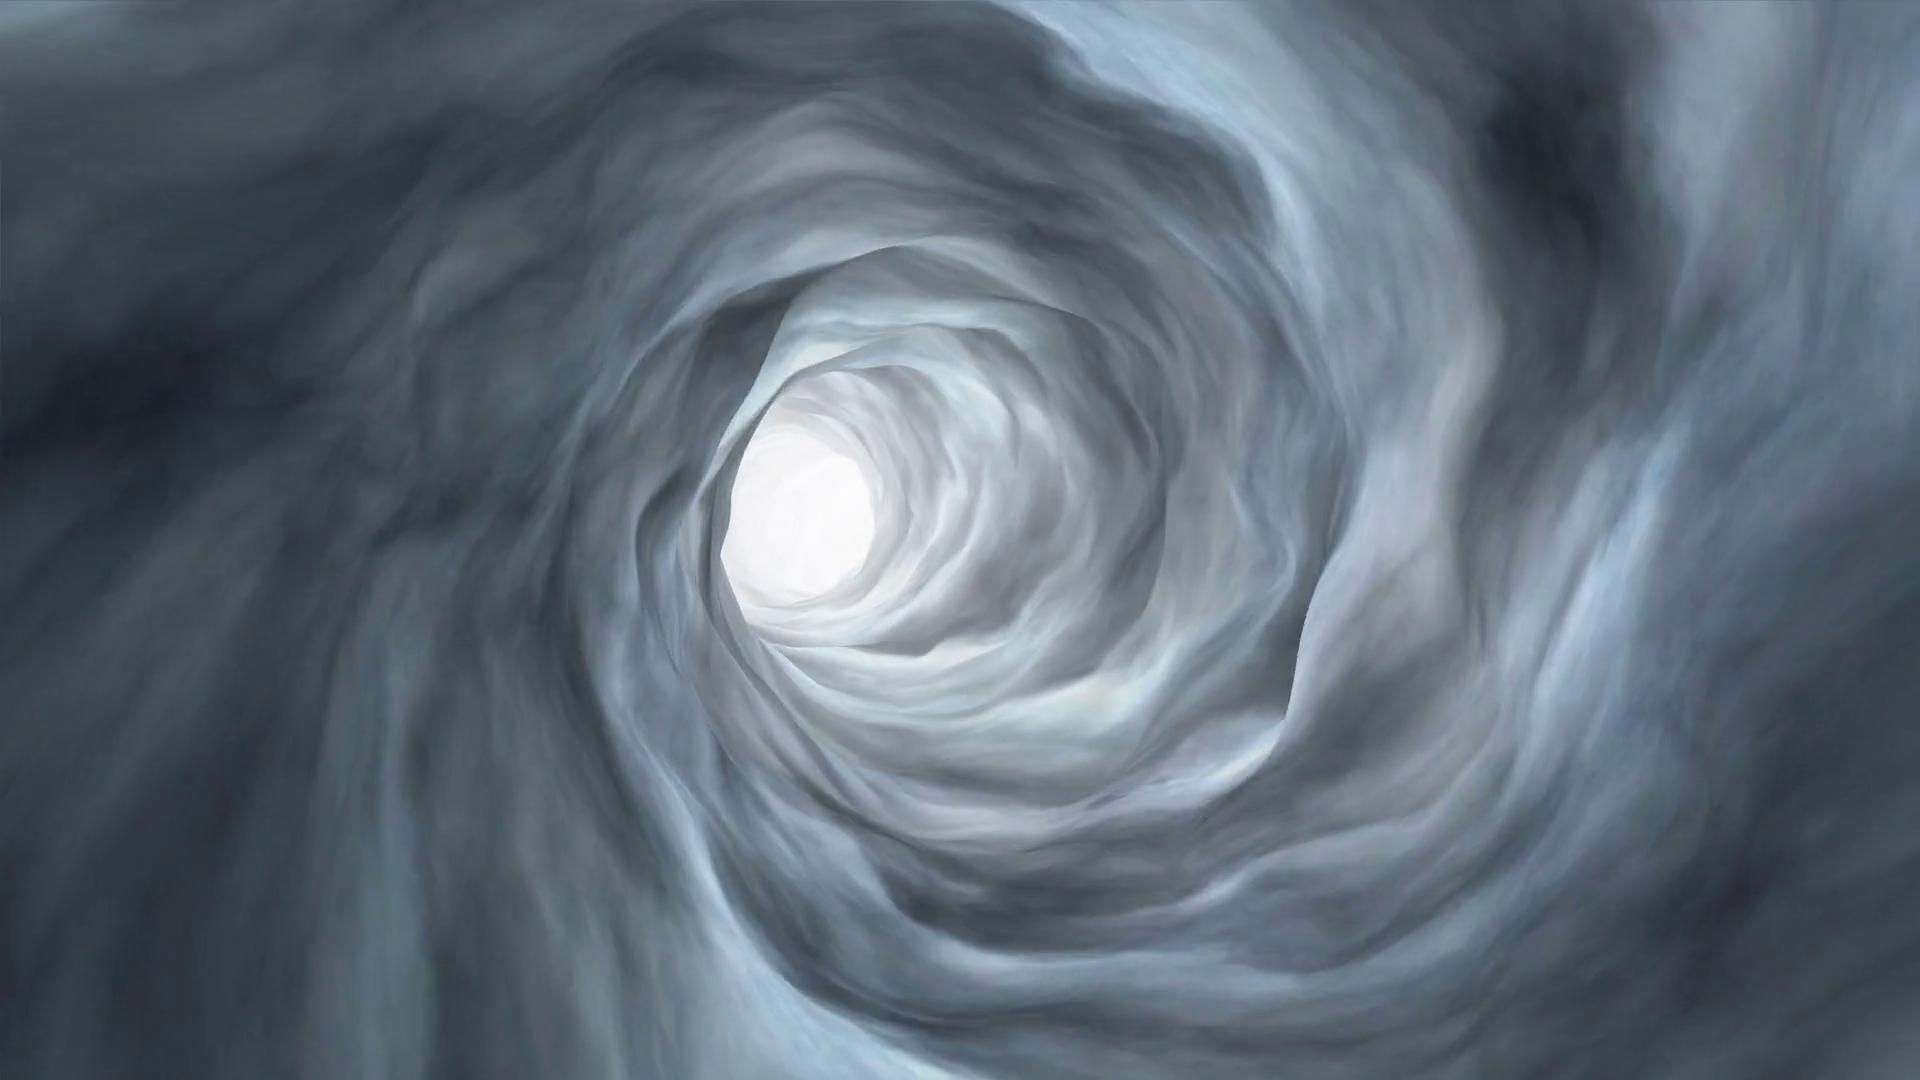 ON - Herbanário Van Richten - Página 3 Flying-though-a-spiral-smoke-tunnel-version-1-white-grey_bjjjepvye_thumbnail-1080_02